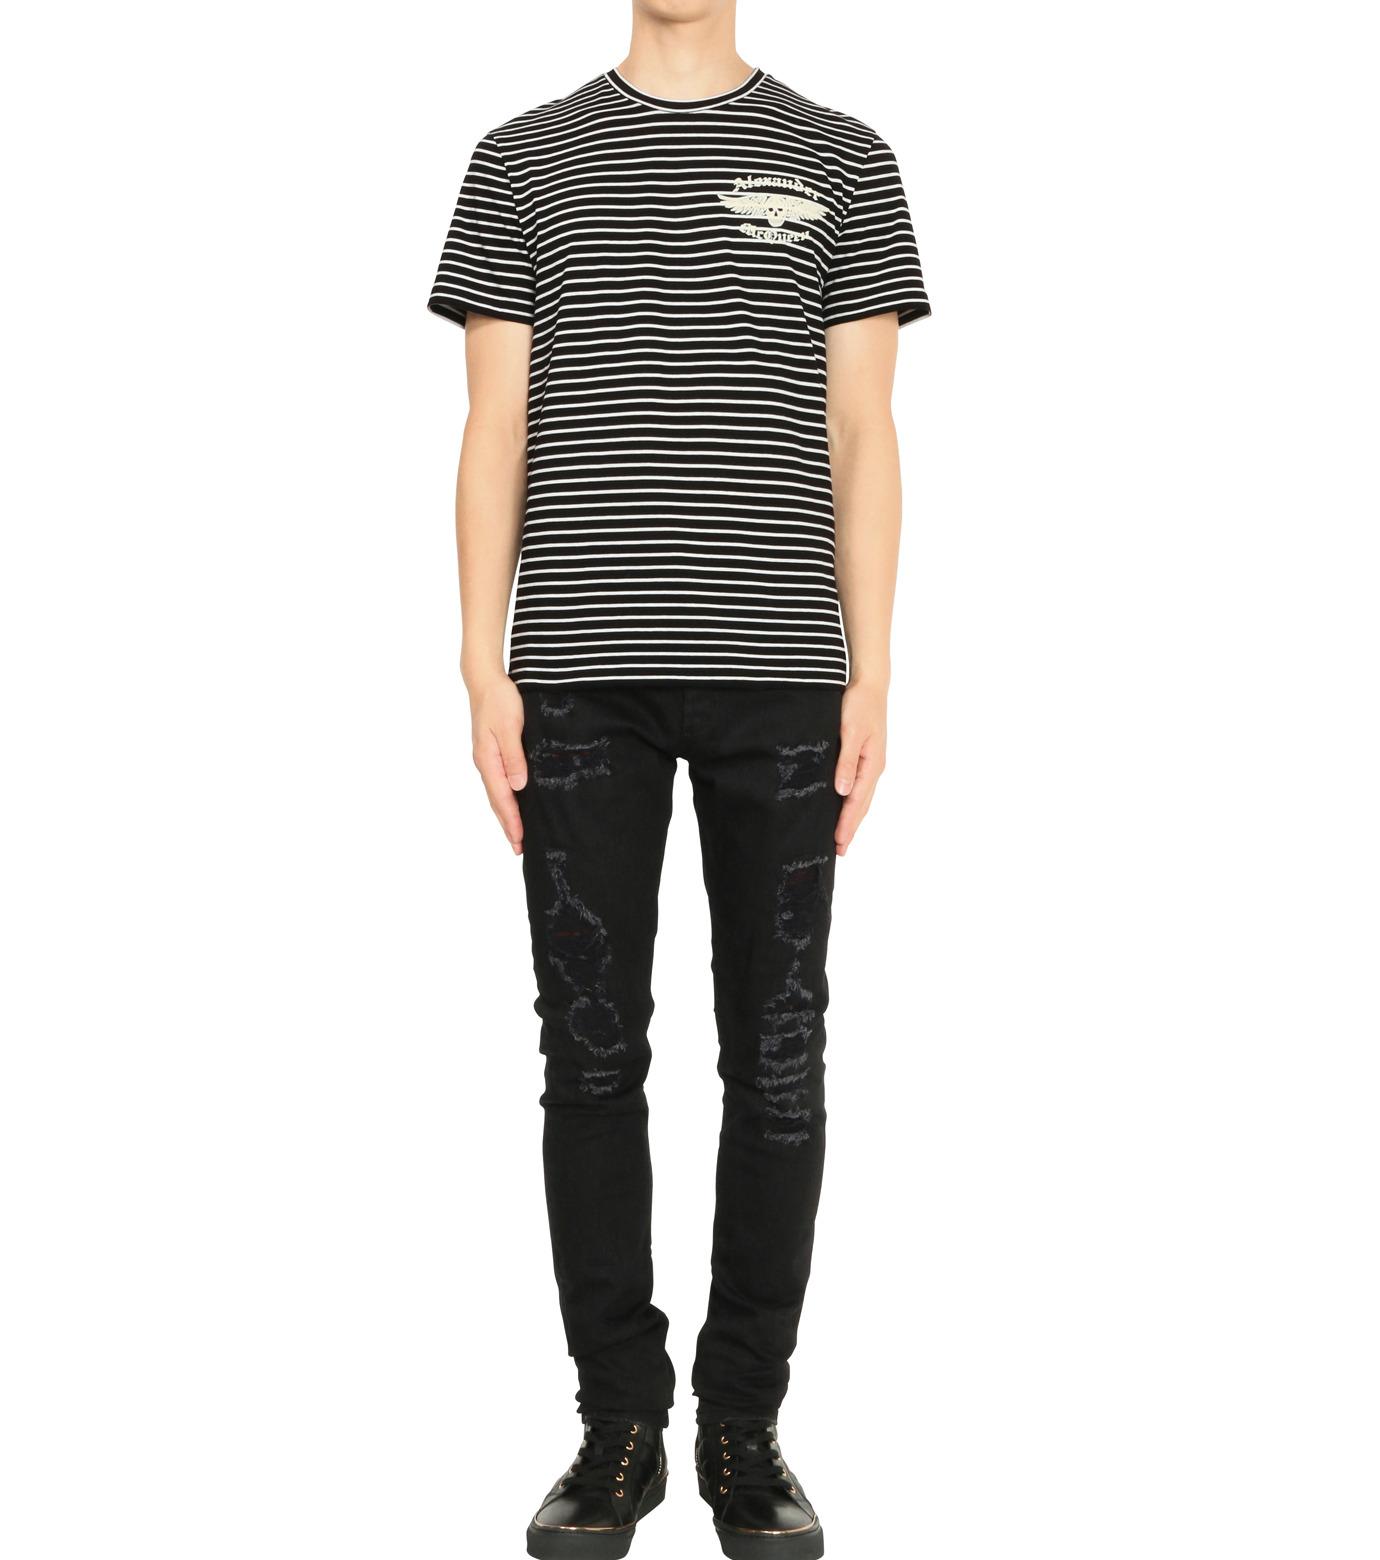 Alexander McQueen(アレキサンダーマックイーン)のBorder T Shirt-BLACK(カットソー/cut and sewn)-430934-13 拡大詳細画像3